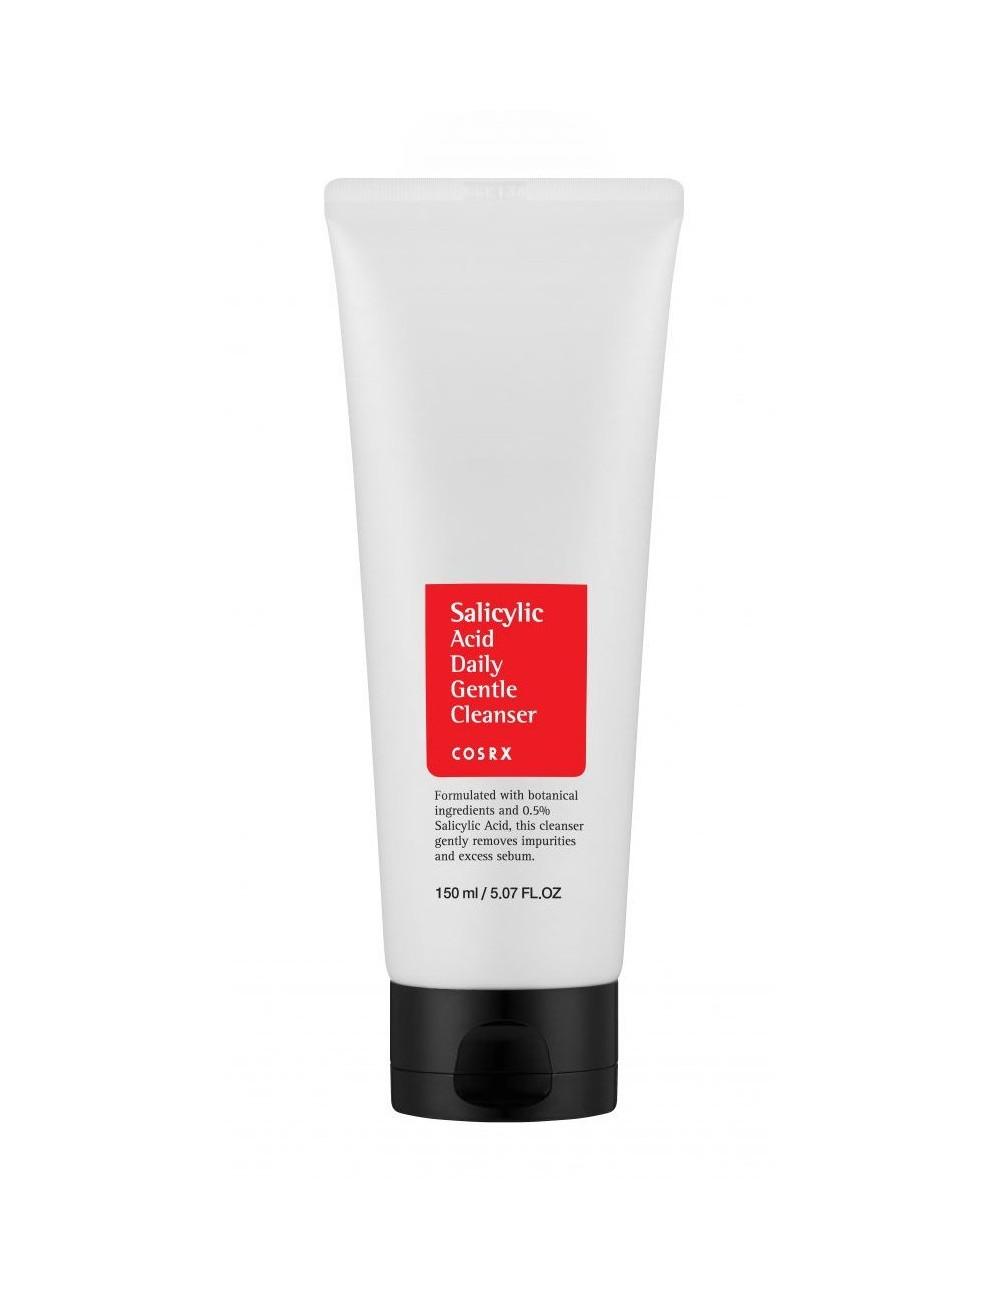 Espuma limpiadora COSRX Salicylic Acid Daily Gentle Cleanser